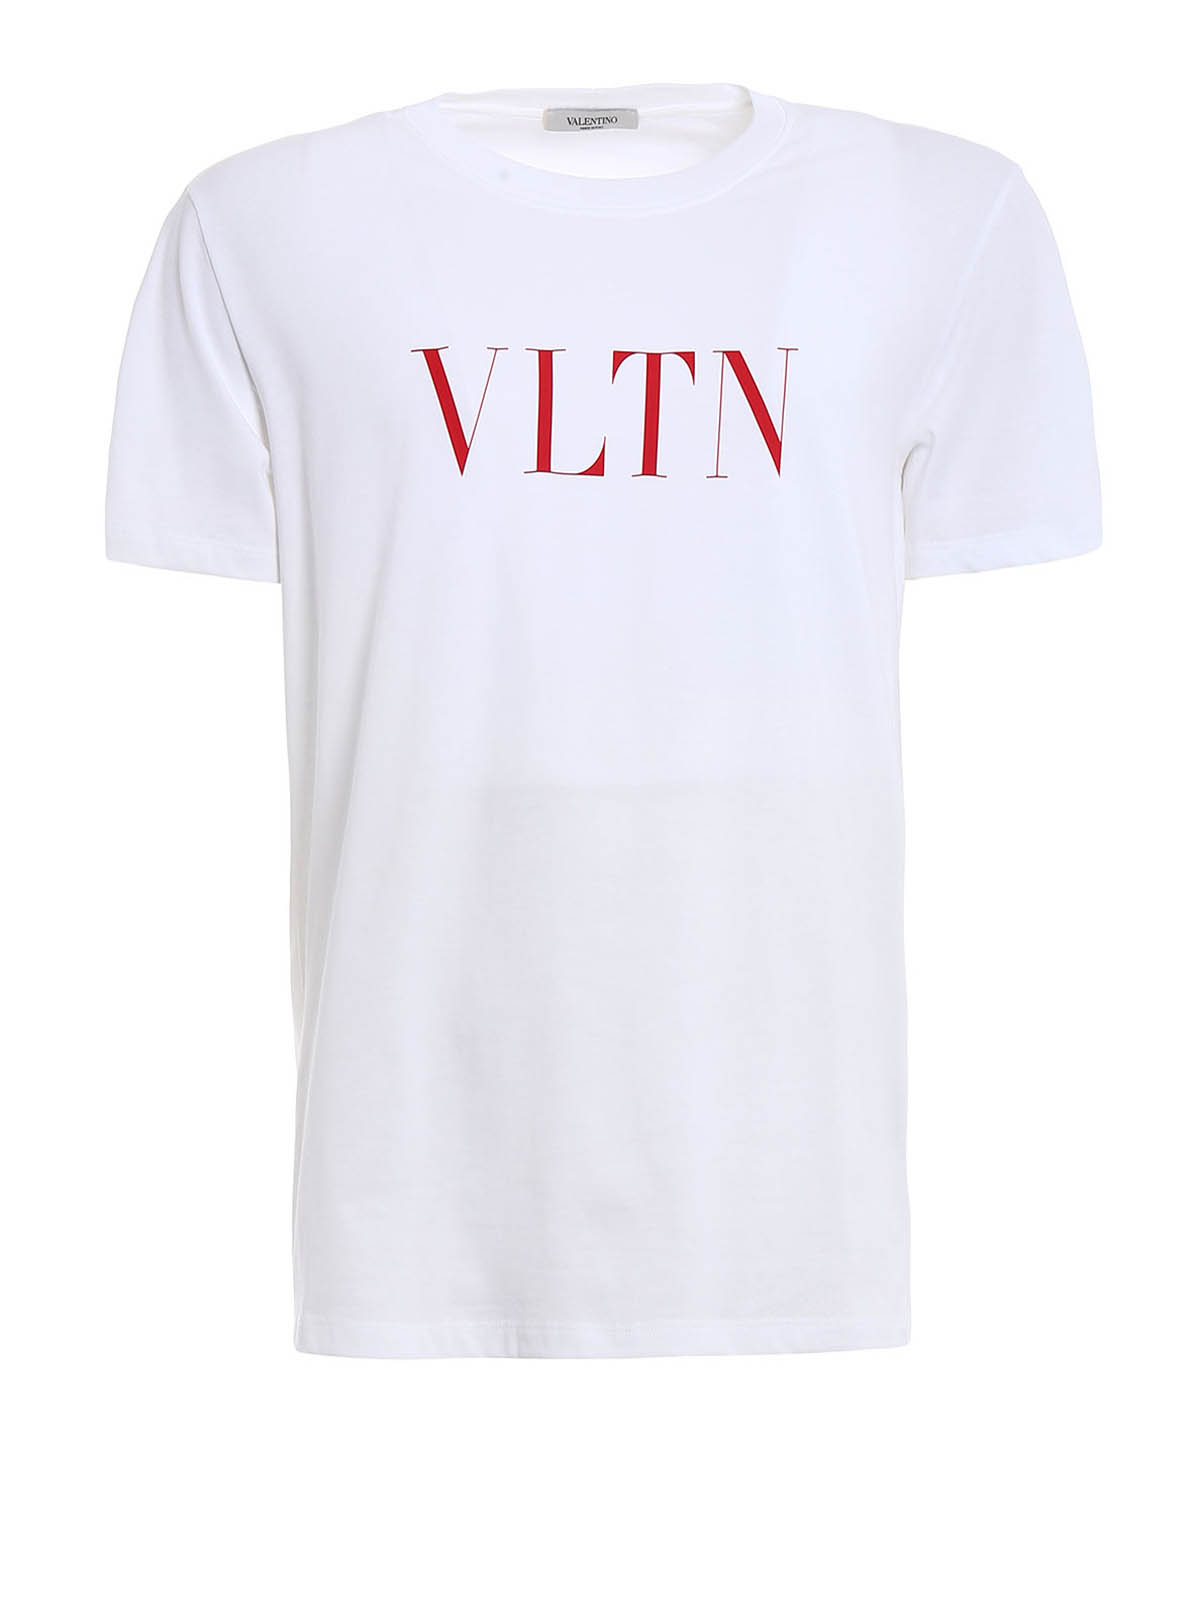 Vltn print white t shirt by valentino t shirts ikrix for White t shirt printing